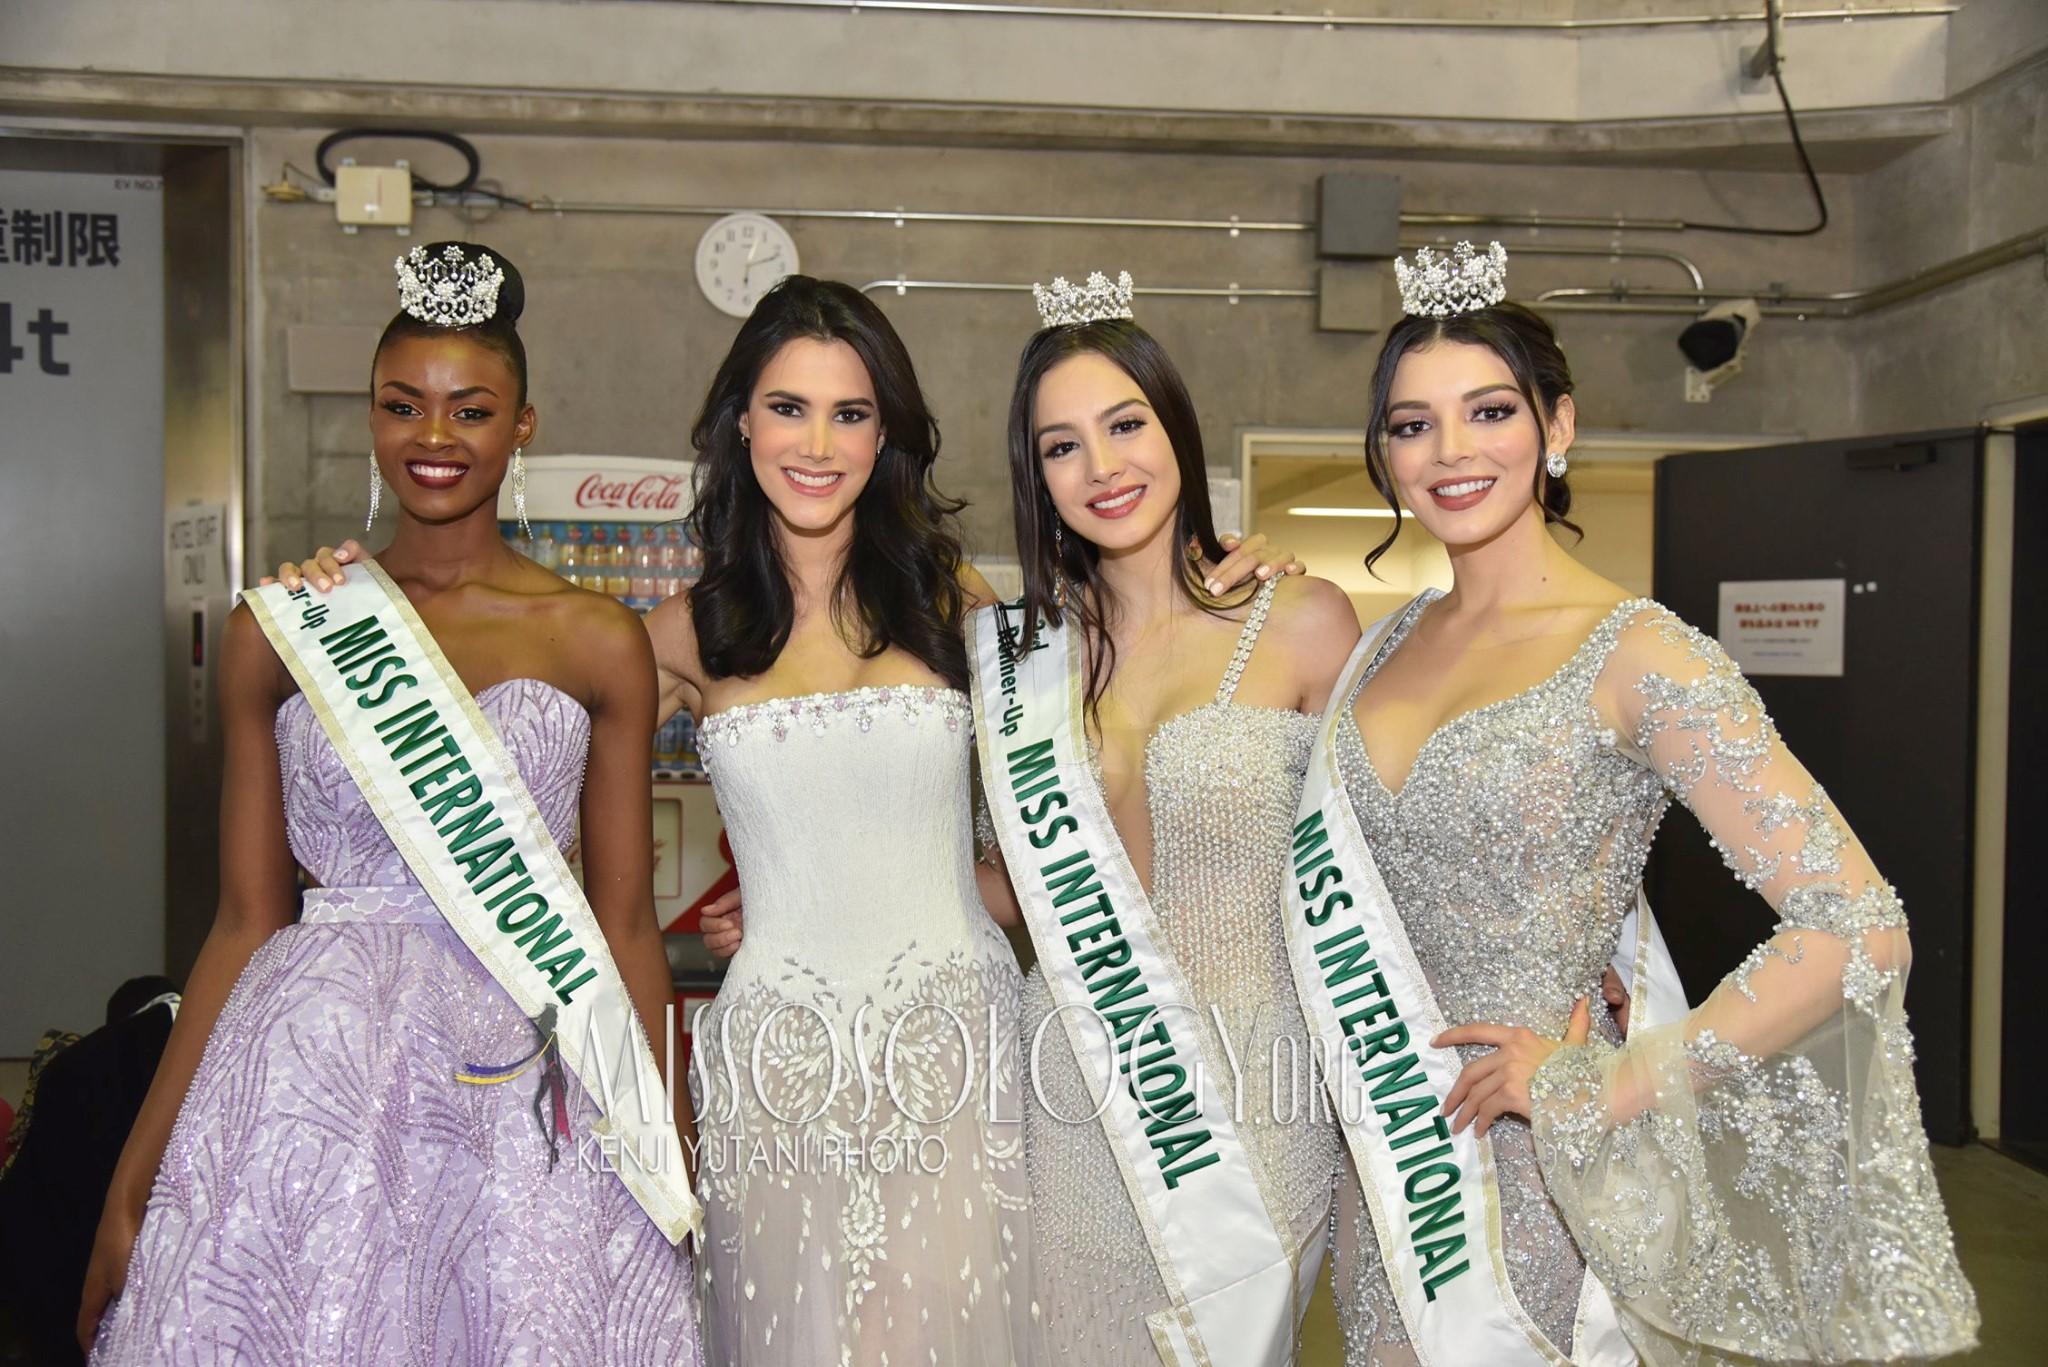 maria alejandra vengoechea, miss colombia hispanoamericana 2021/3rd runner-up de miss international 2019. - Página 13 74216710